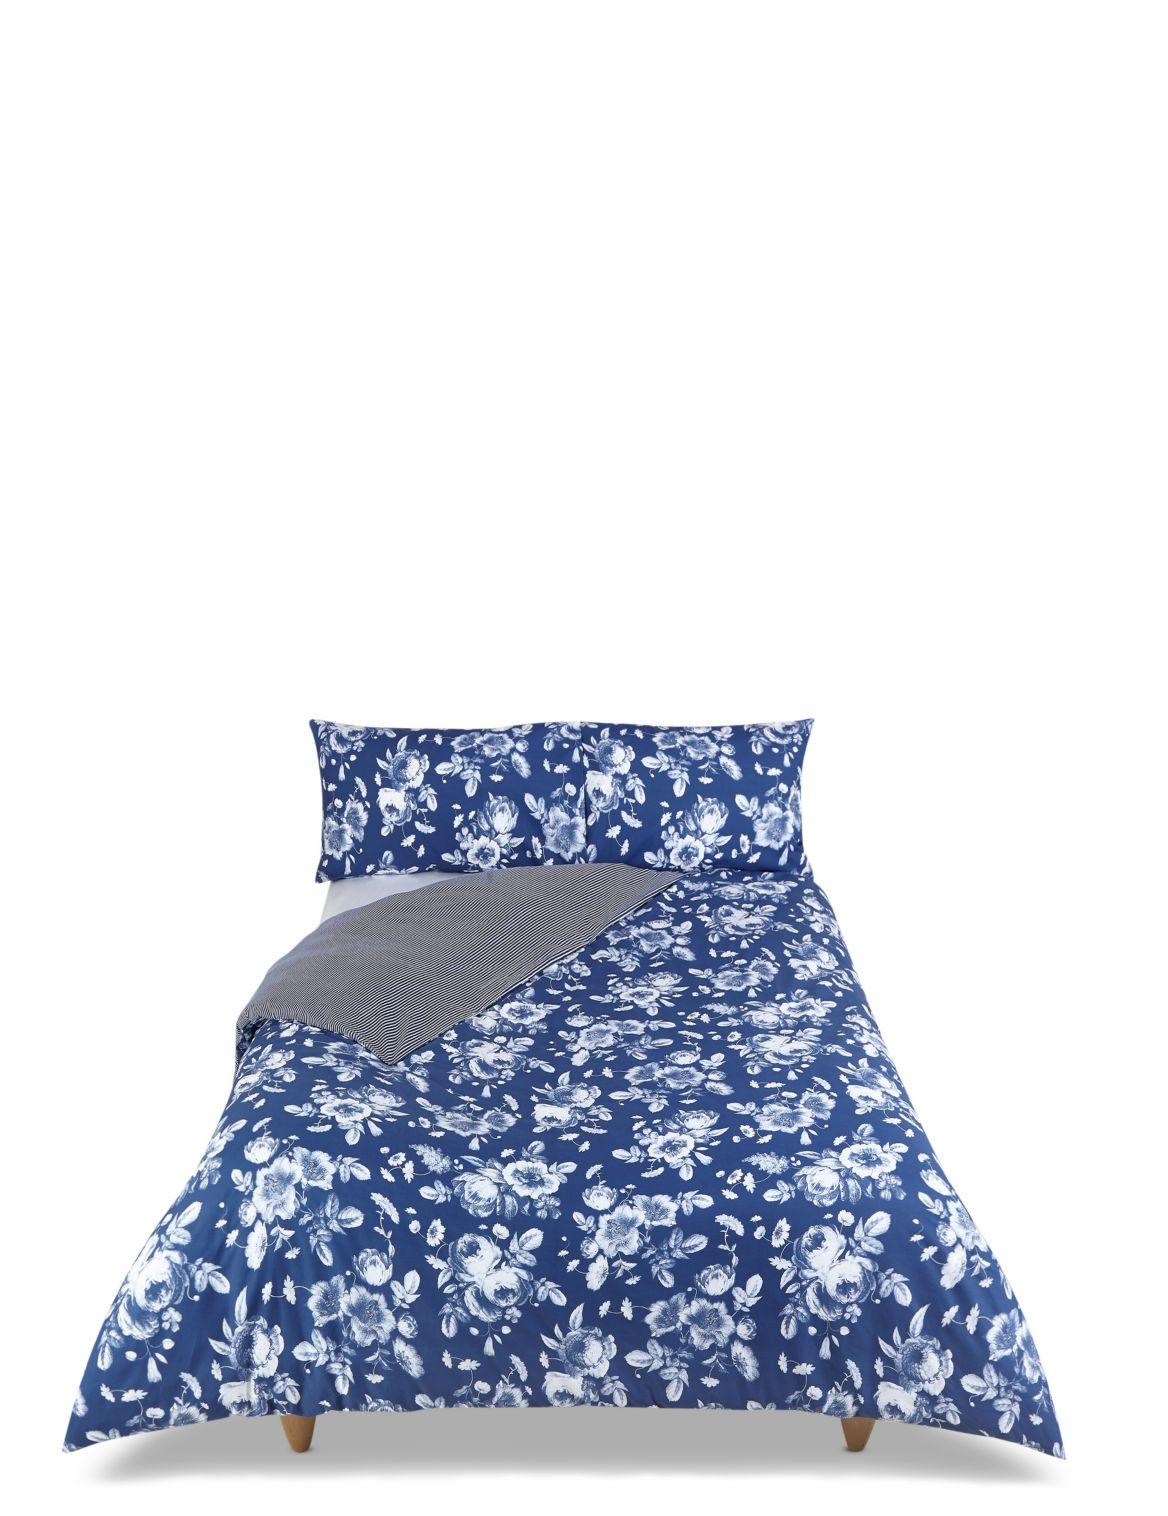 Signature Floral Bedding Set navy mix